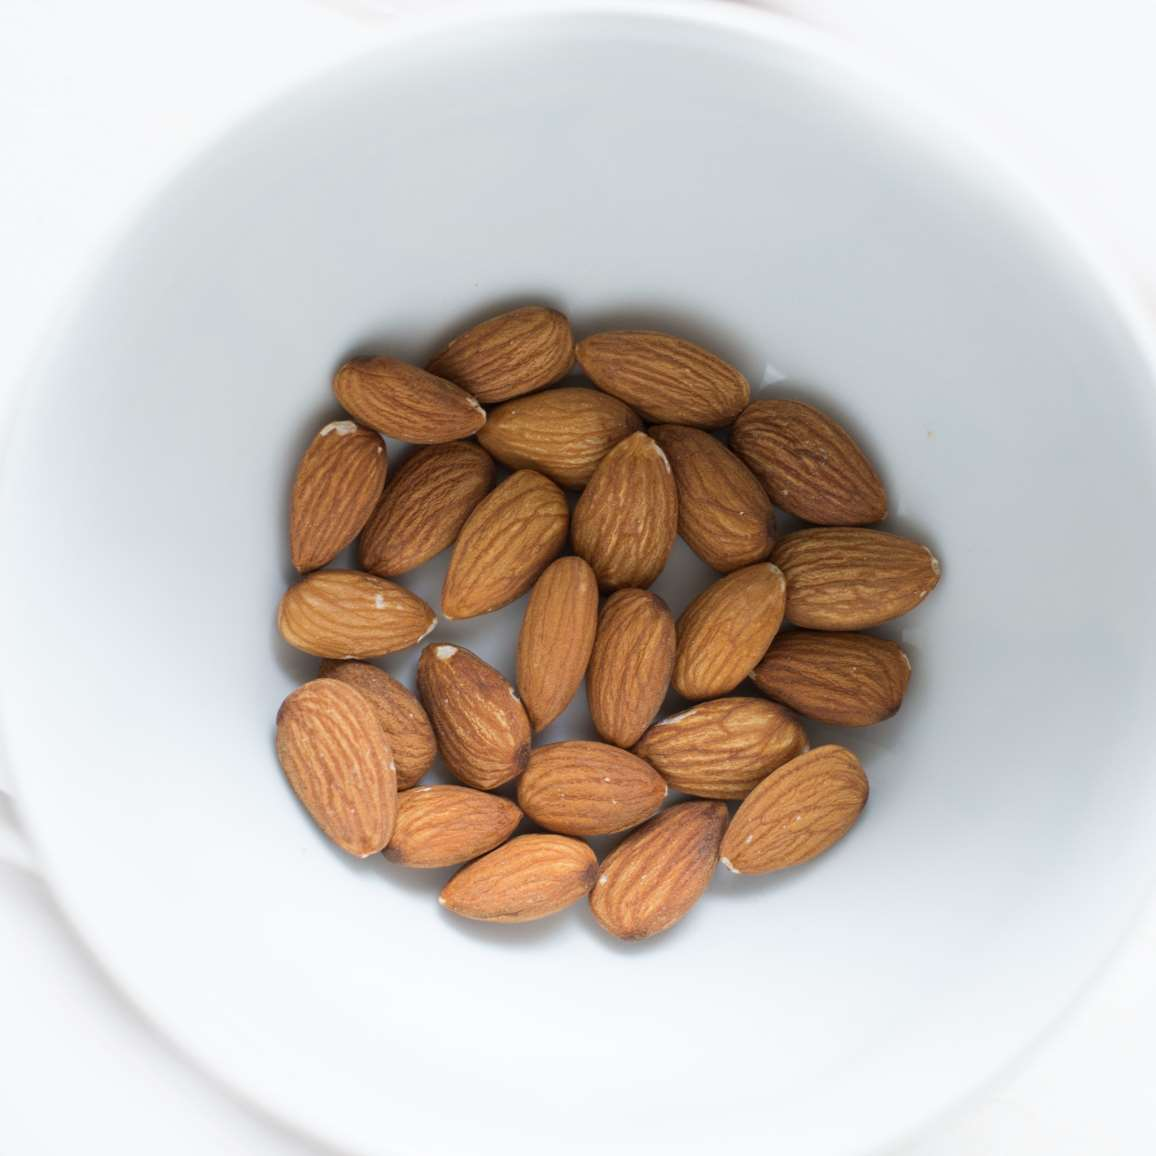 almonds%20to%20eat%20at%20night.jpg